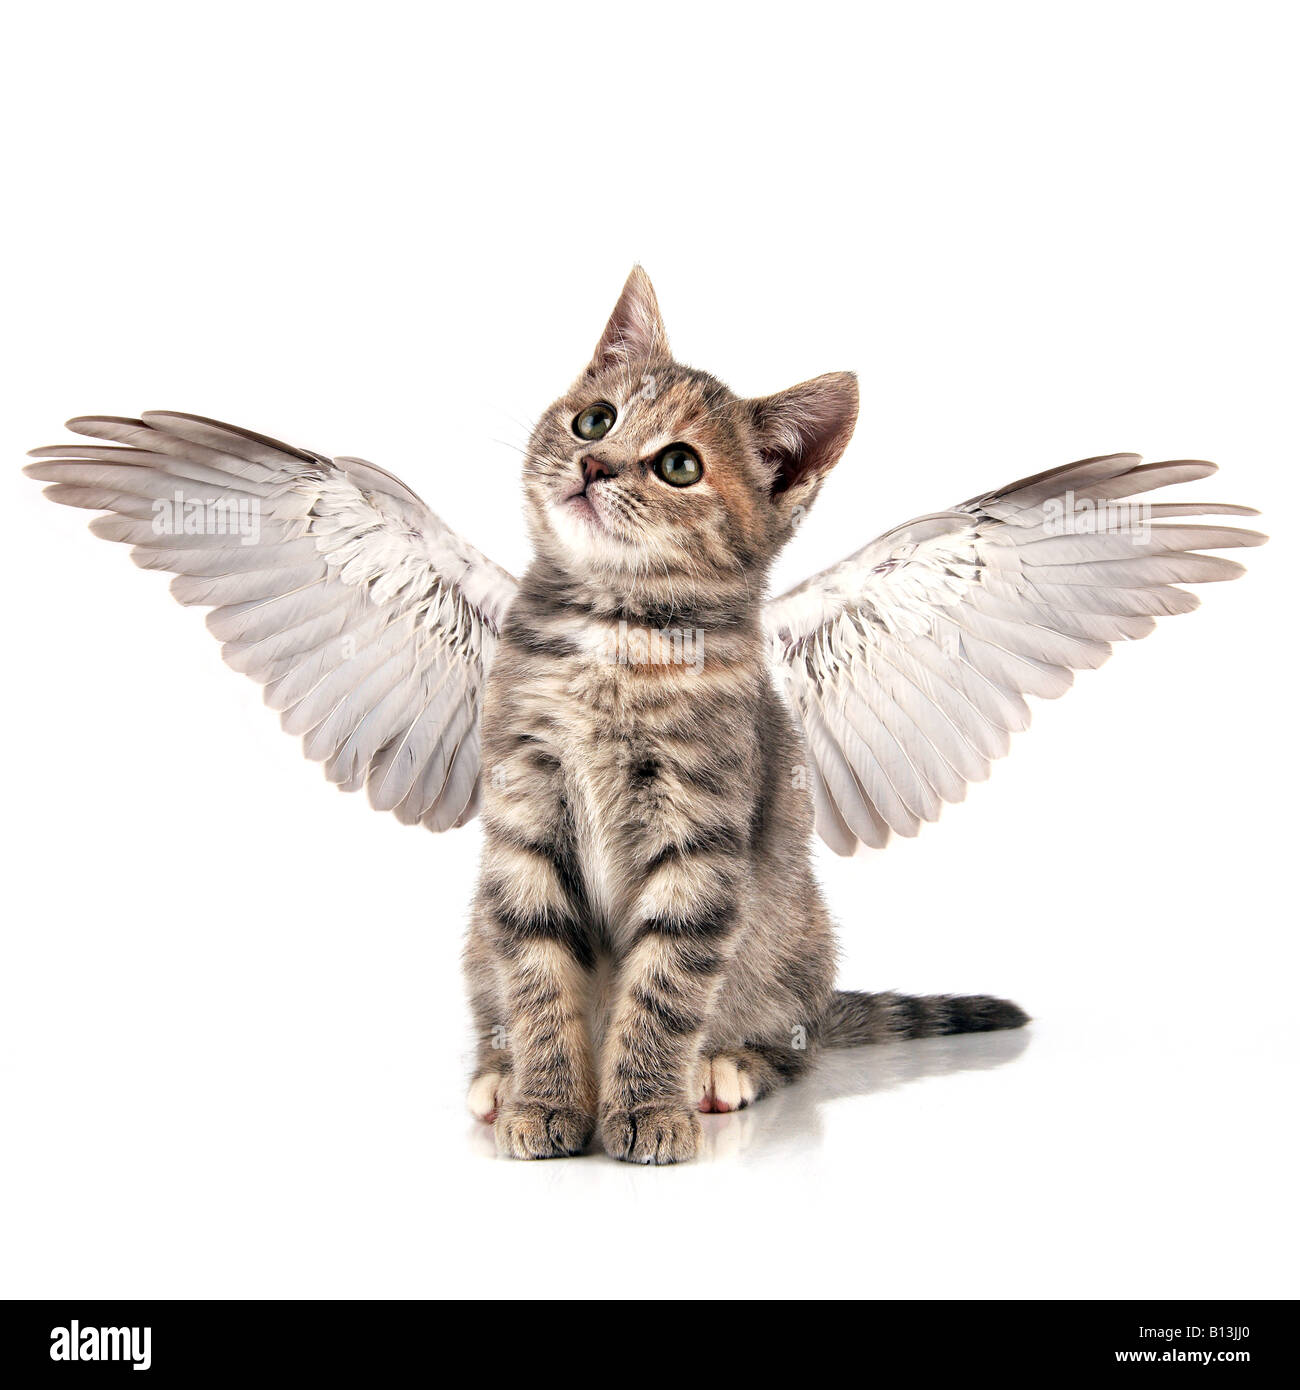 Engel Kätzchen Stockbild